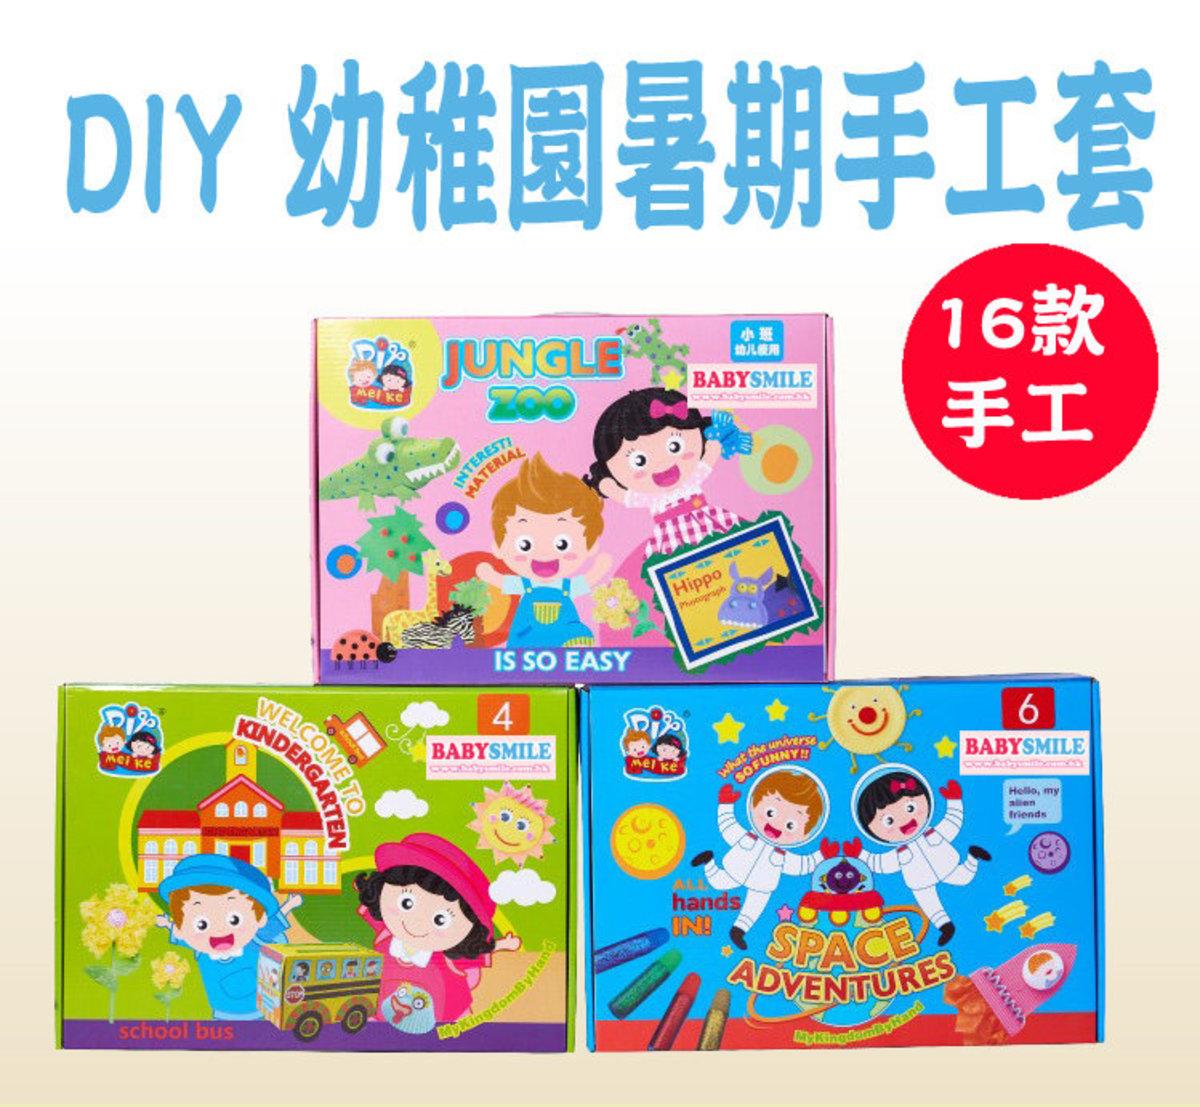 Pre-School-Primary School DIY HandCraft set - include 16 set of art with instruction sheet (3-4 yr)